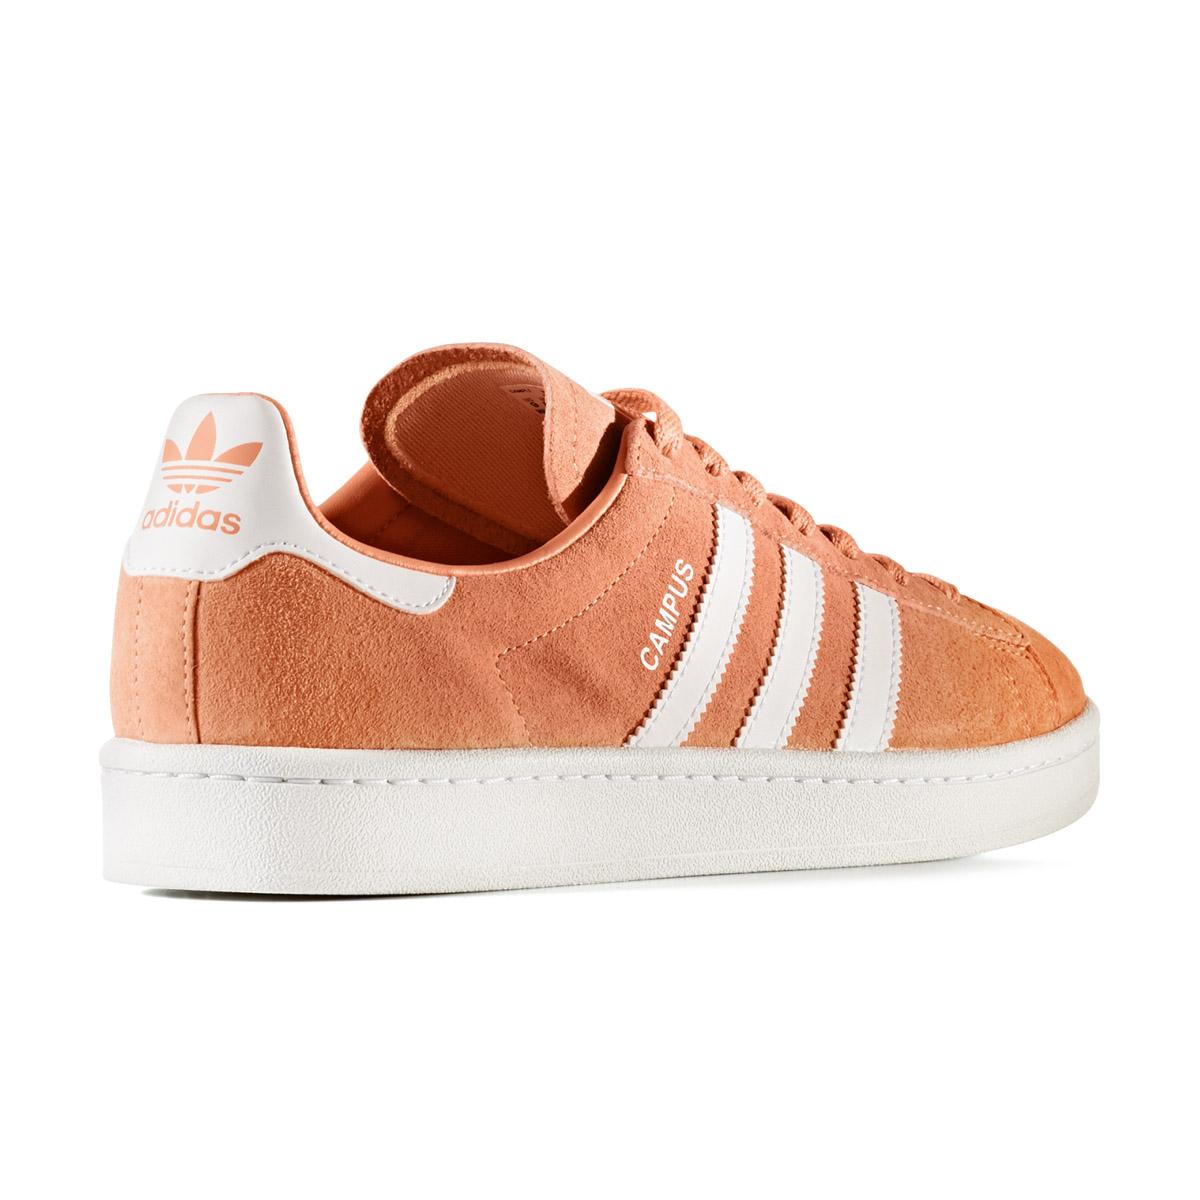 adidas Originals CAMPUS (Adidas original scan pass) (Easy Orange/Running  White/Crystal White) 17FW-I